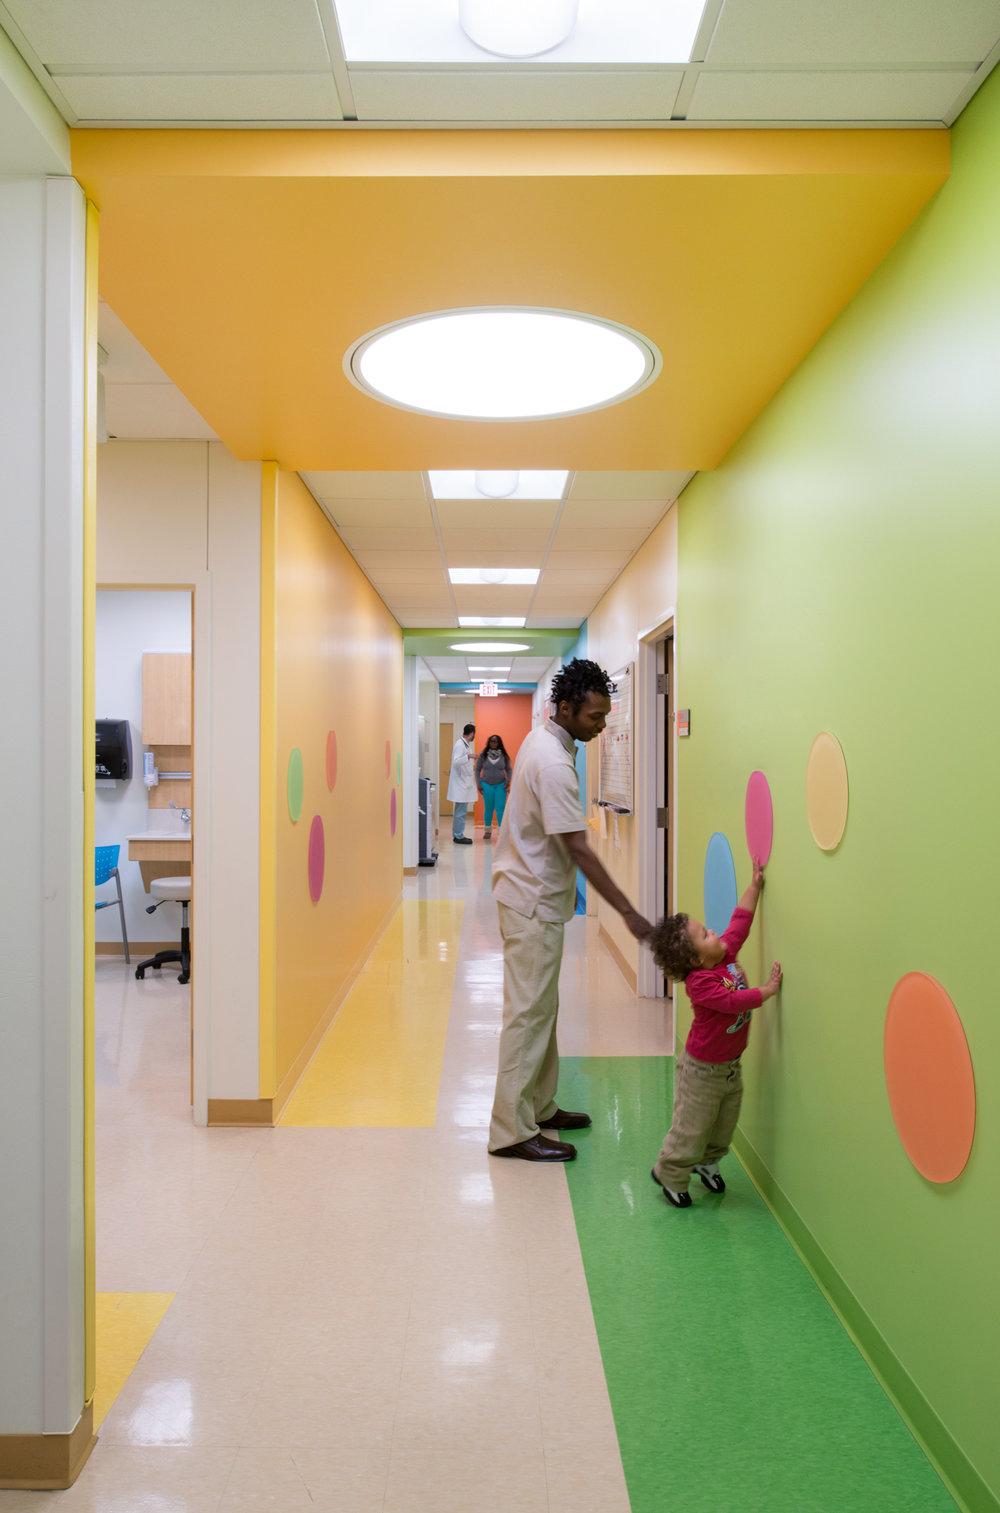 DMC carls reno corridor view kn03 web size.jpg